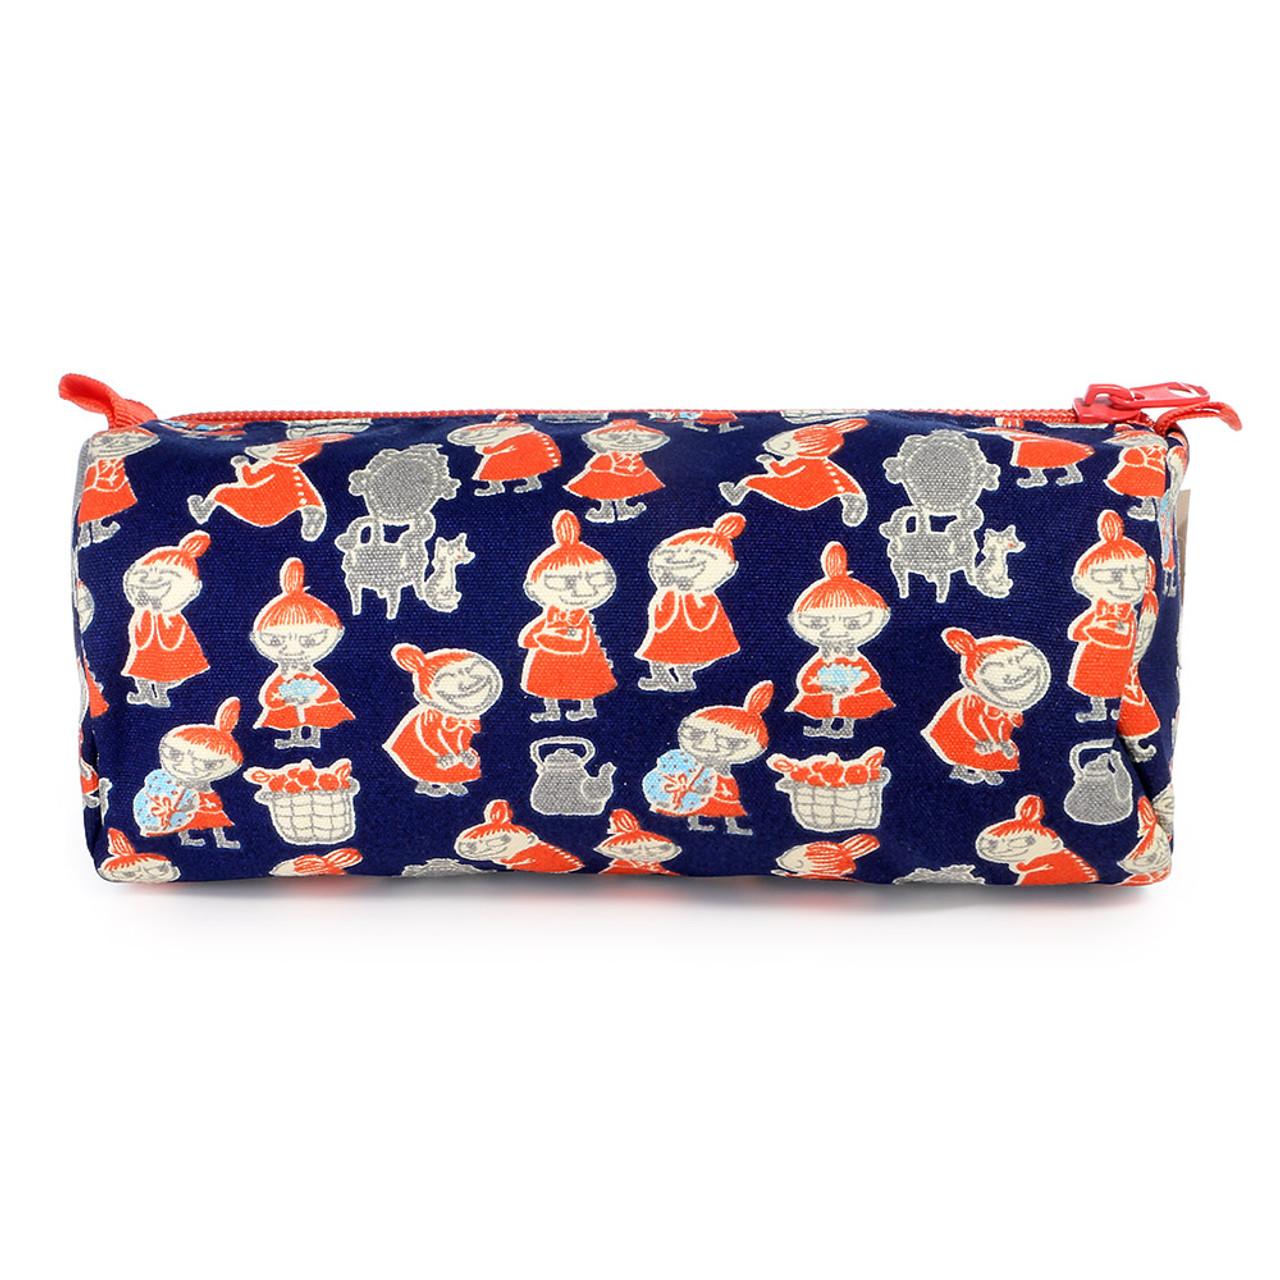 Moomin Canvas Barrel Pencil Case - Navy Blue  ( Front View )